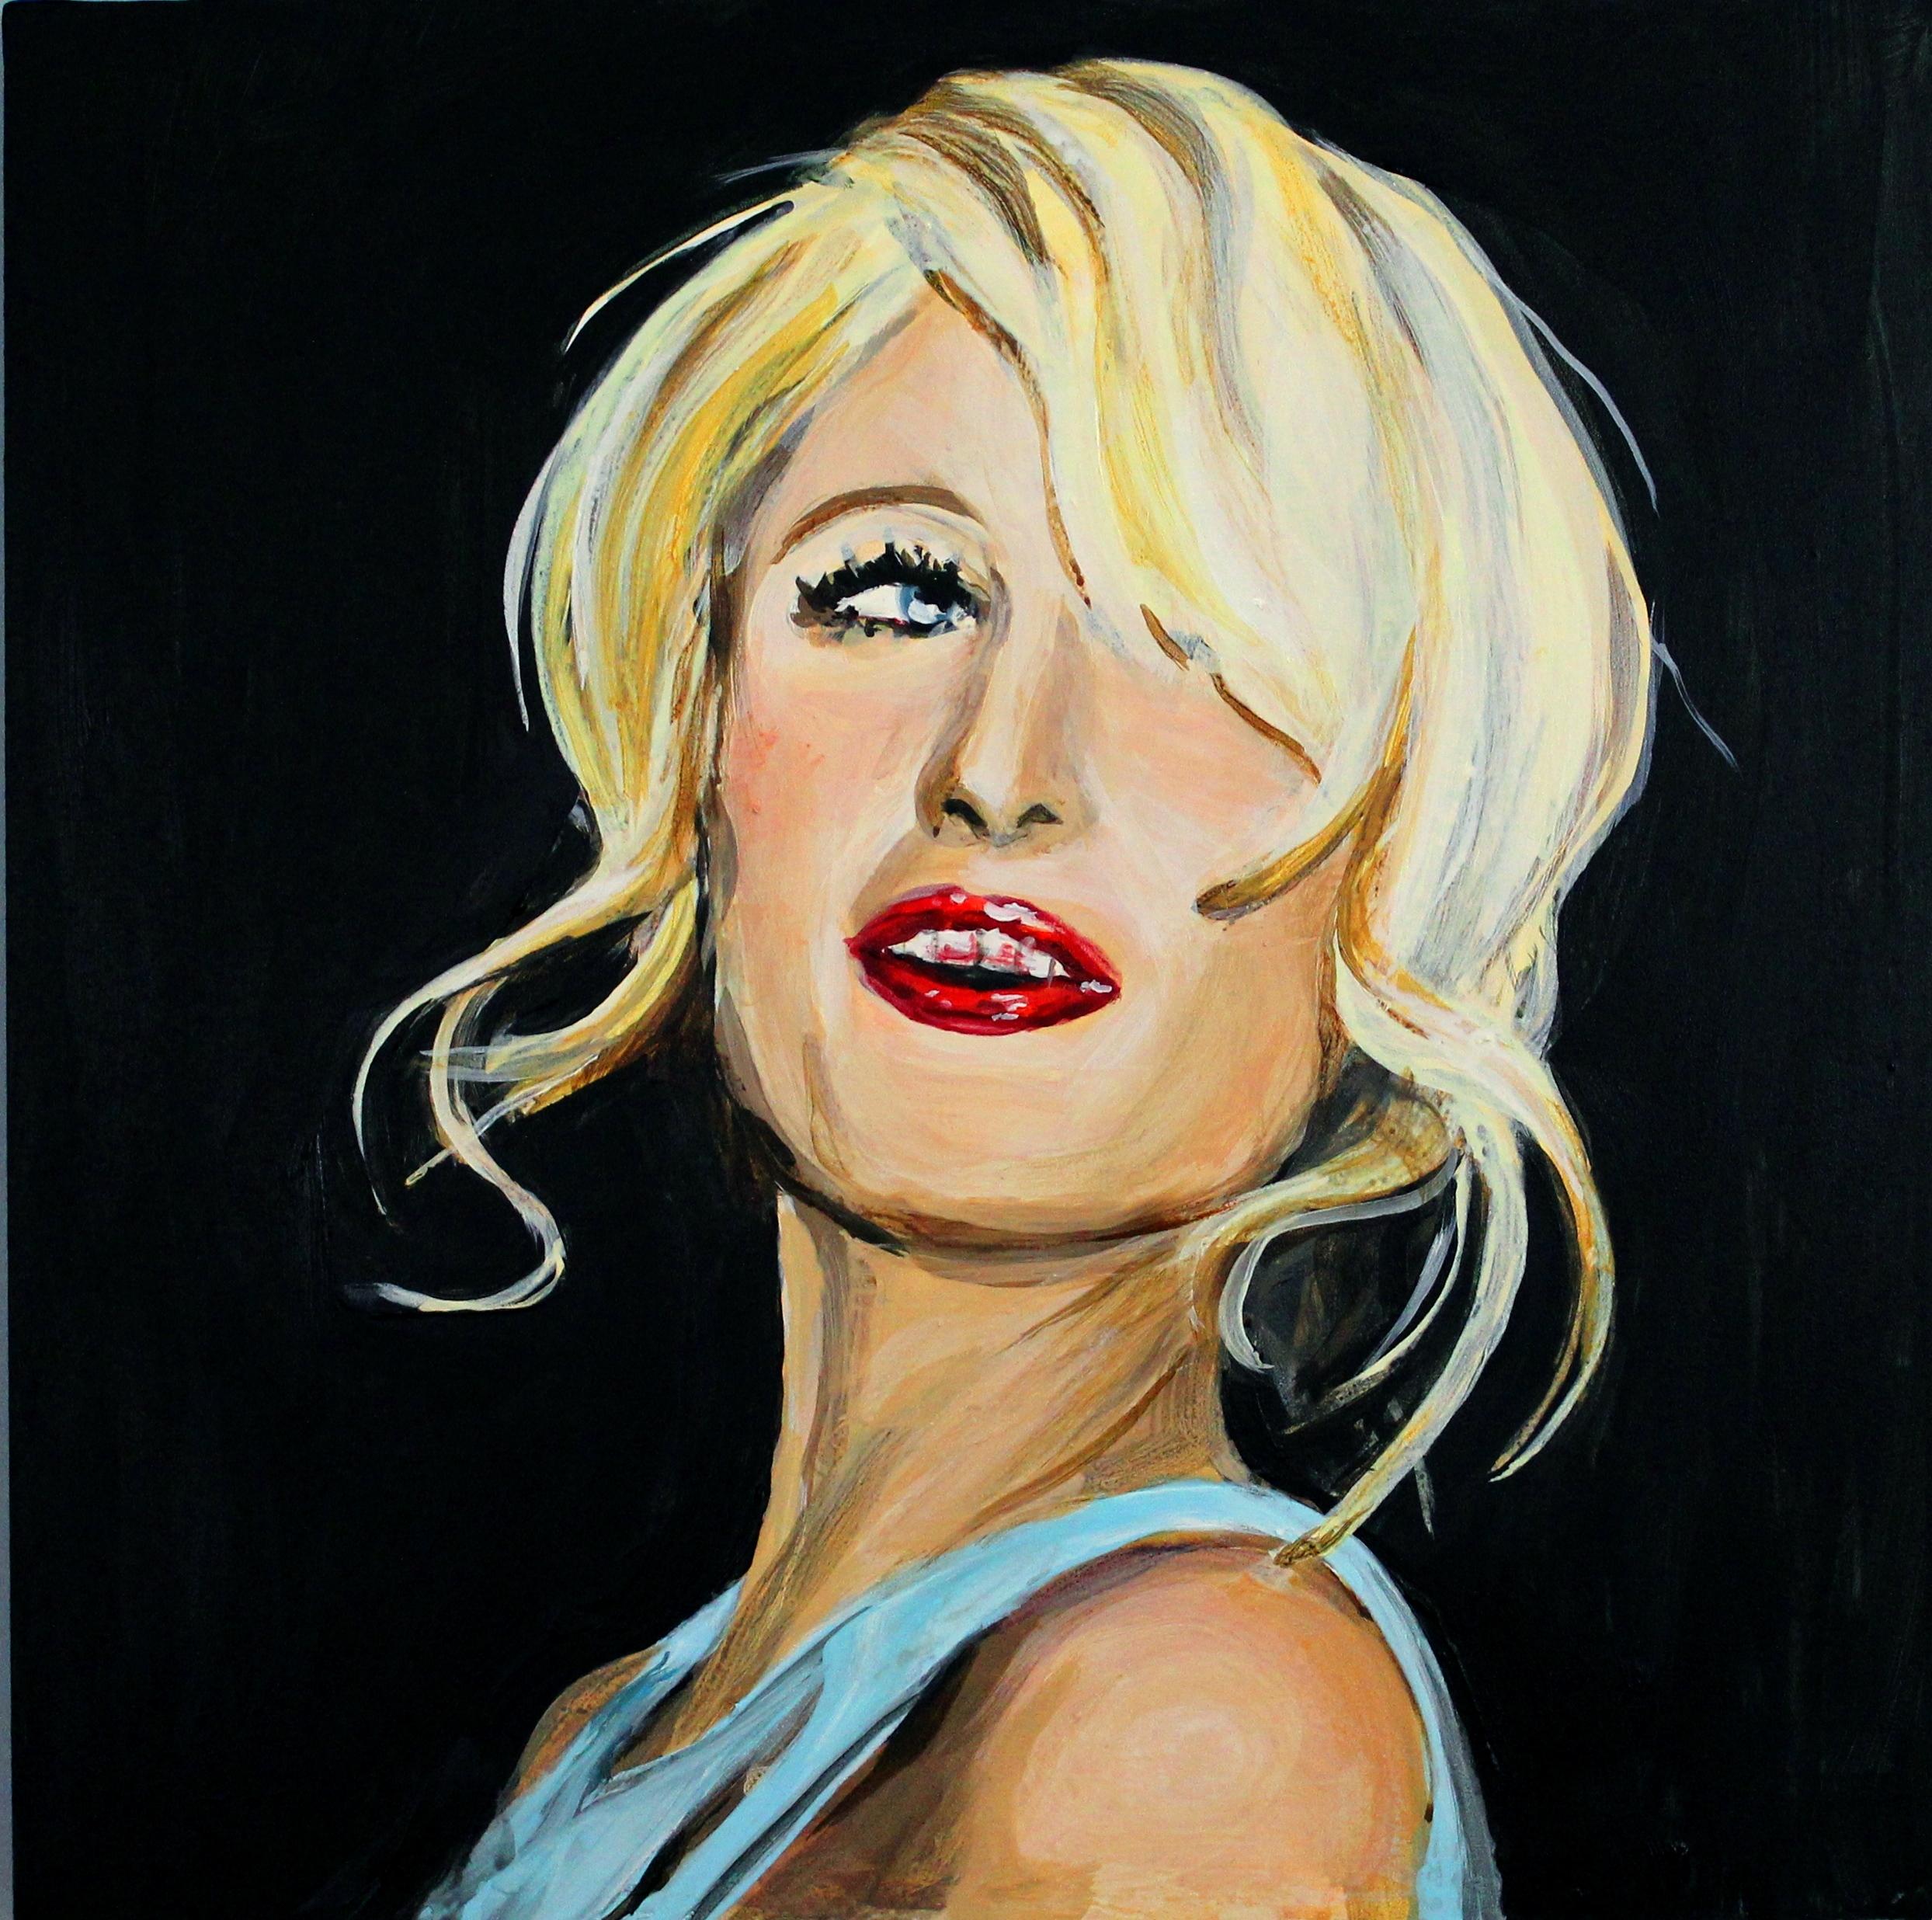 "Paris Hilton With Lipstick on Her Teeth   12"" x 12"" acrylic on panel   SOLD"